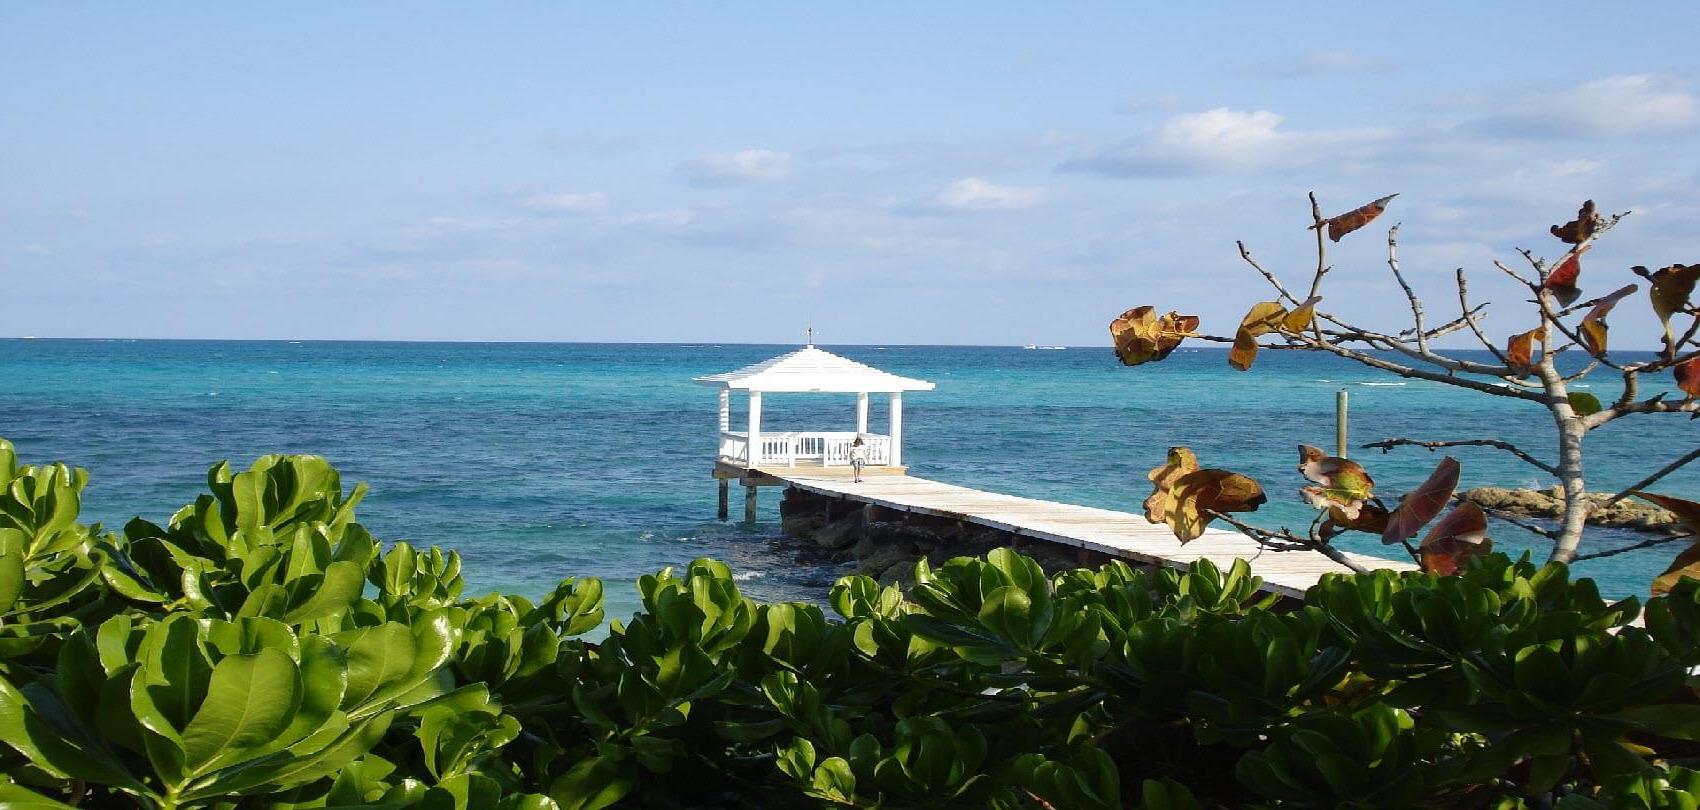 Sandyport, Bahamas